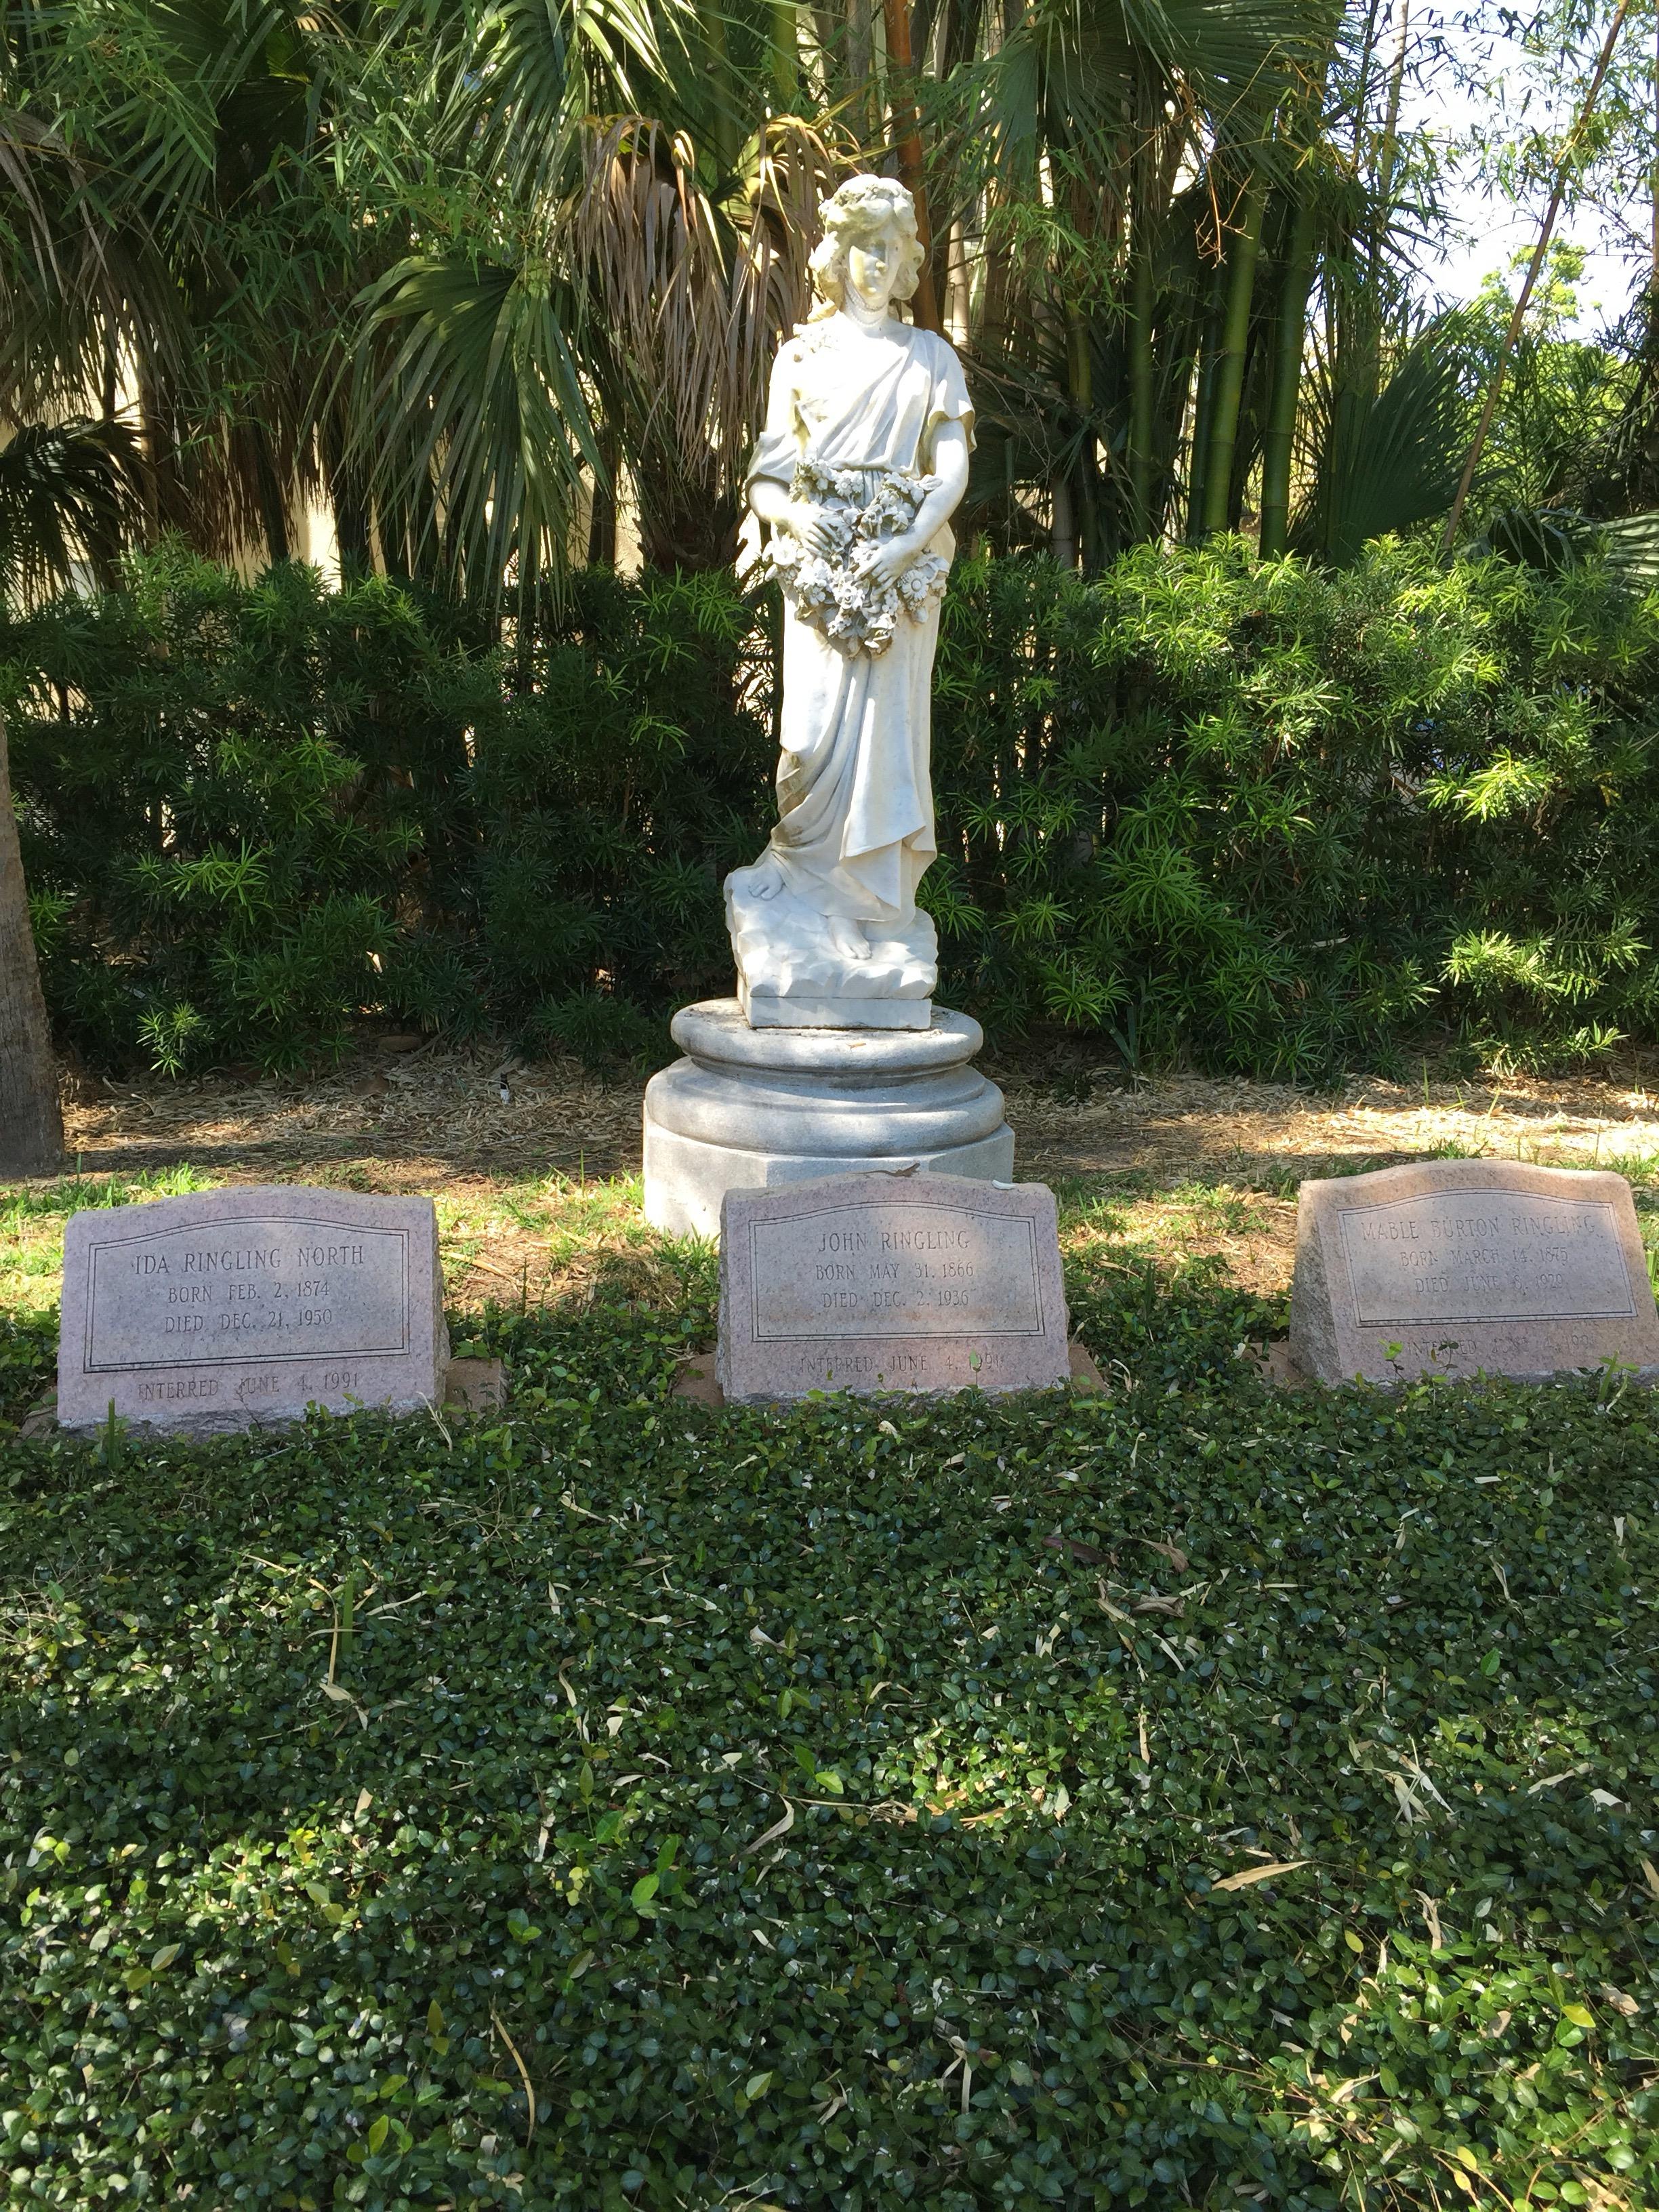 Ca' D' Zan, John Ringling, Ringling Estate, Sarasota, Ringling Circus